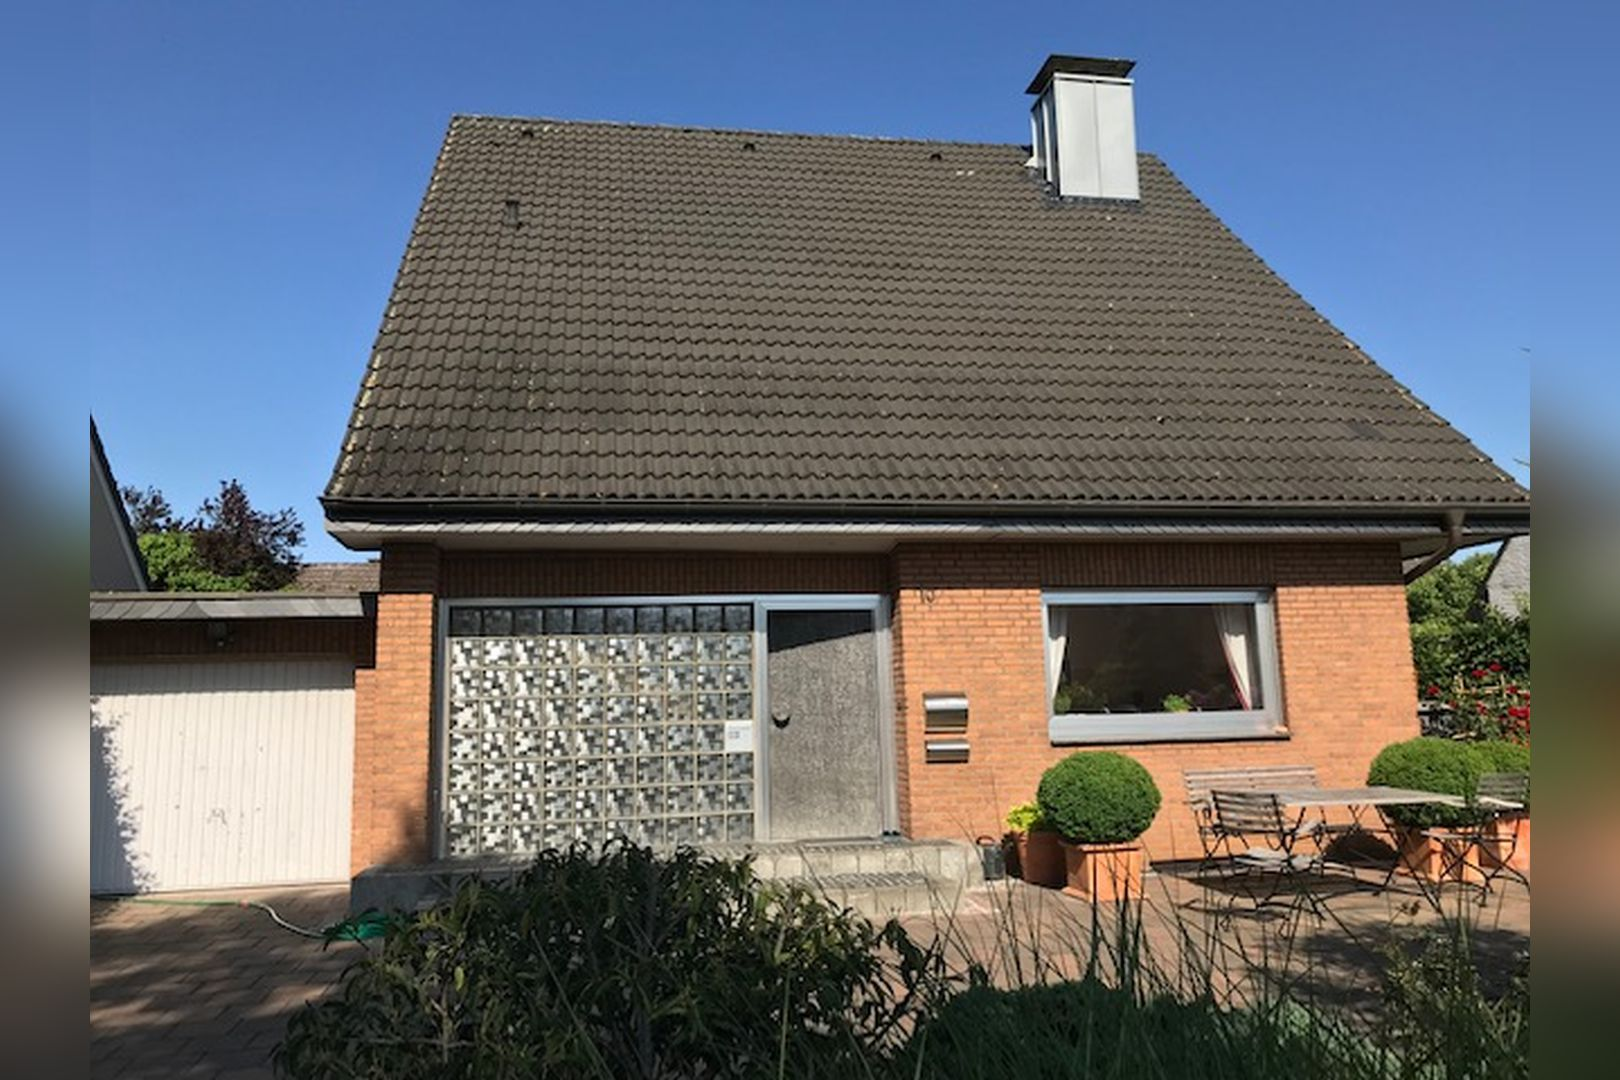 Immobilie Nr.0260 | Am Kamberg 10, 40668 Meerbusch -Bösingh.